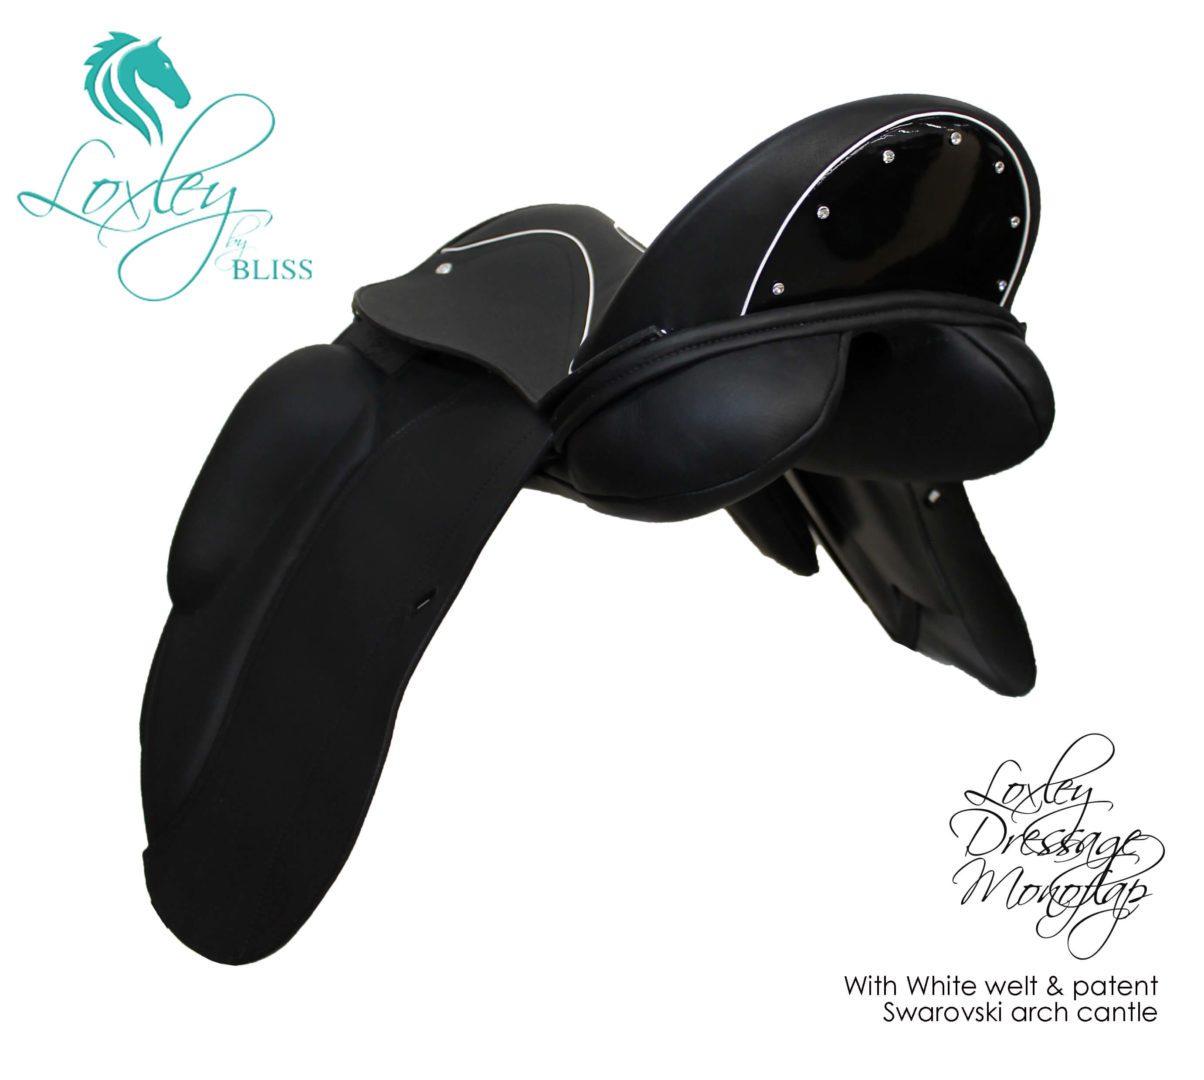 26 loxley dressage mono 34 Black white patent arch